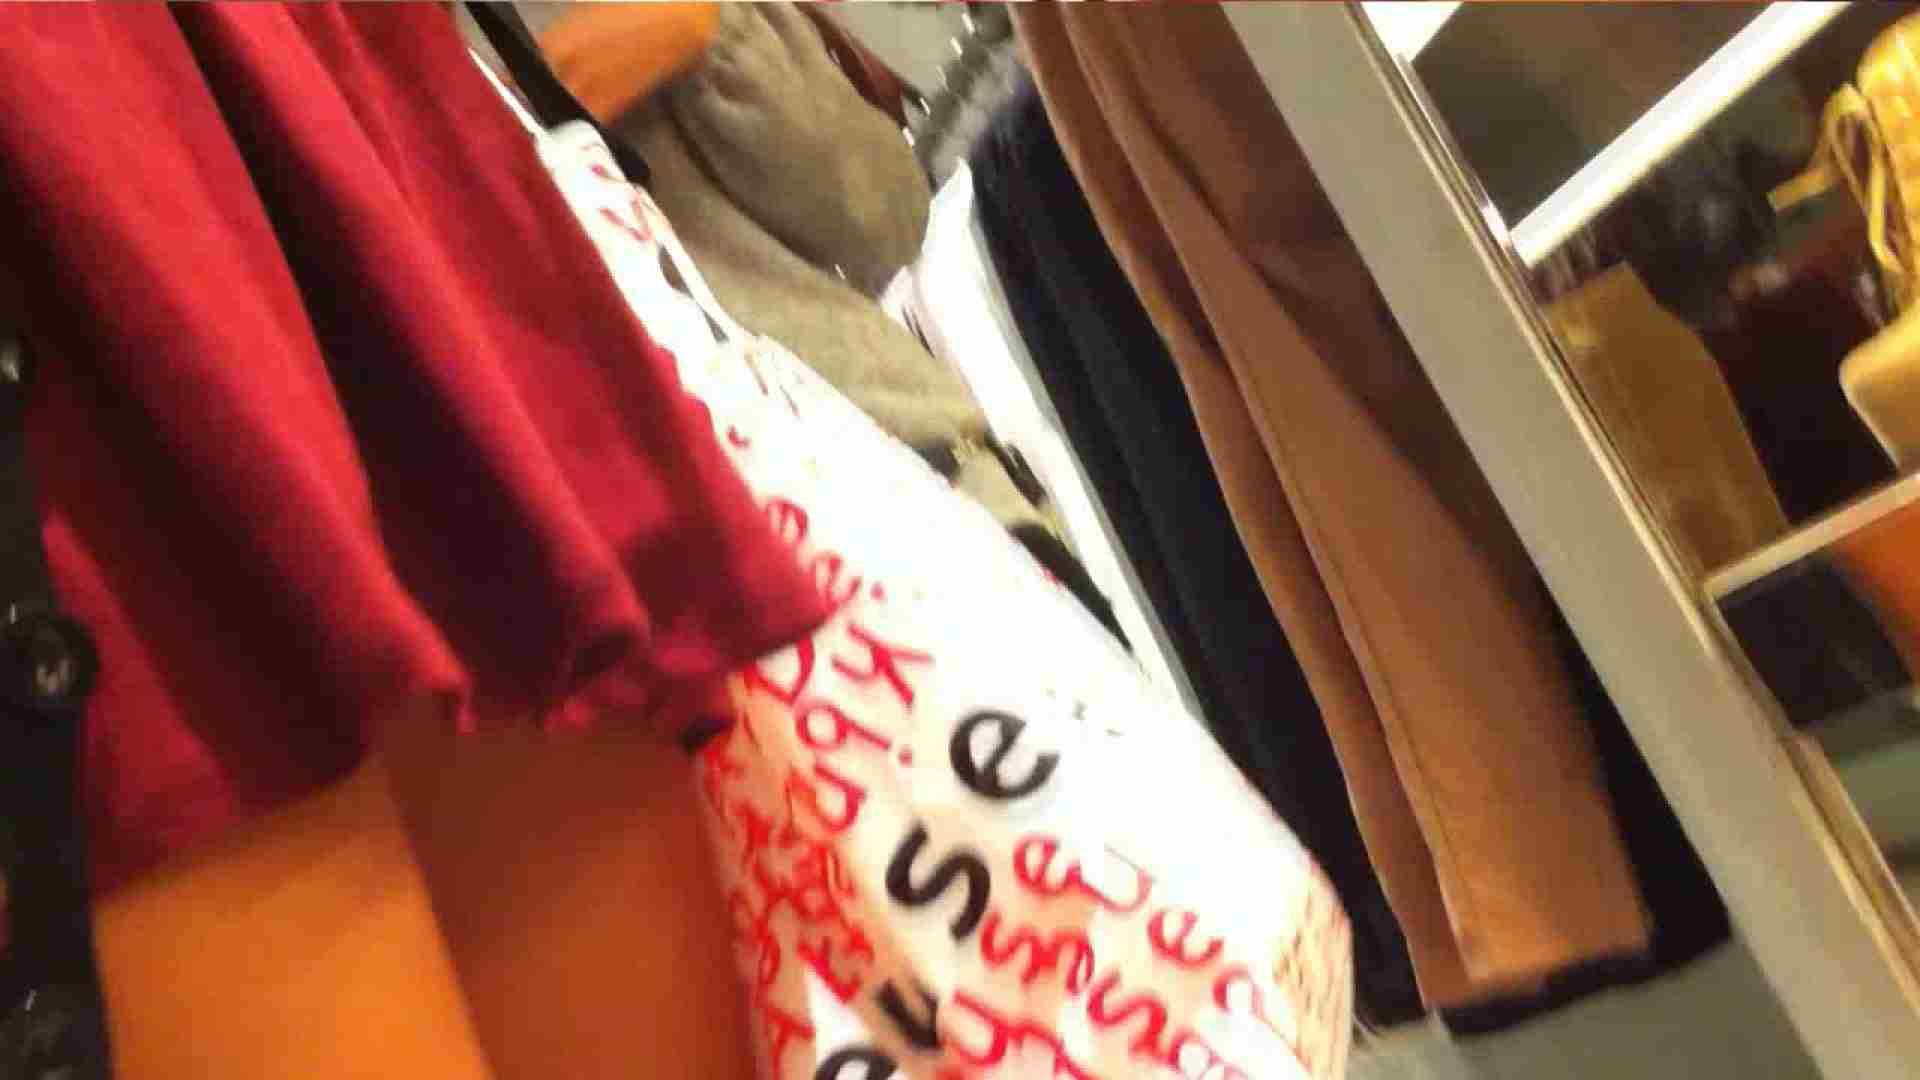 vol.33 美人アパレル胸チラ&パンチラ ギャル系ネーチャンの下着 下着姿 盗み撮り動画 94pic 37